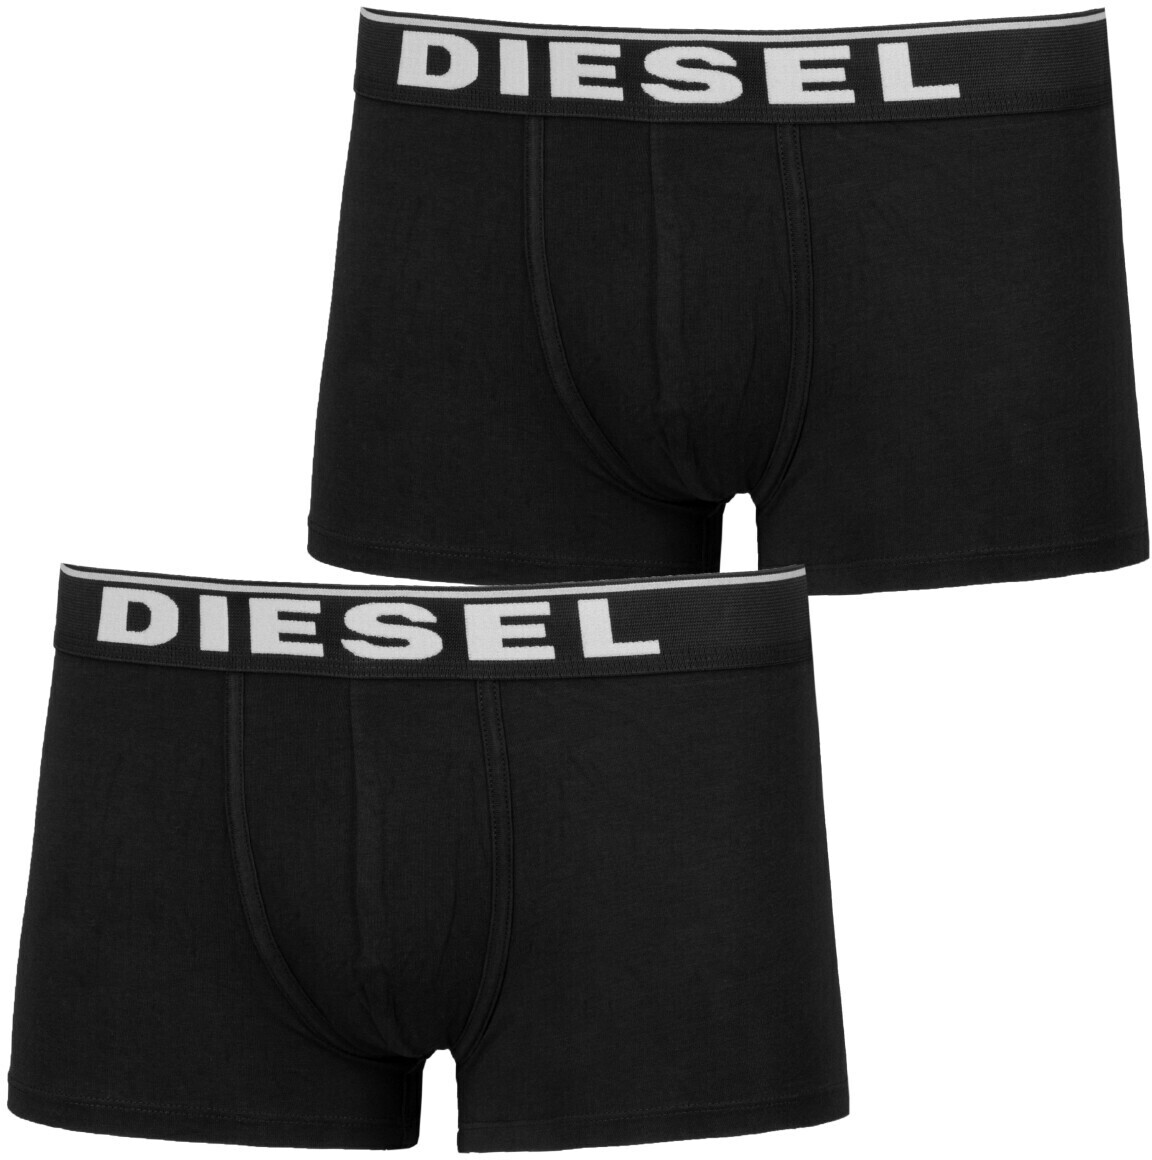 Image of Diesel 2-Pack Damien ebony (00SMKX-0JKKB-E1350)